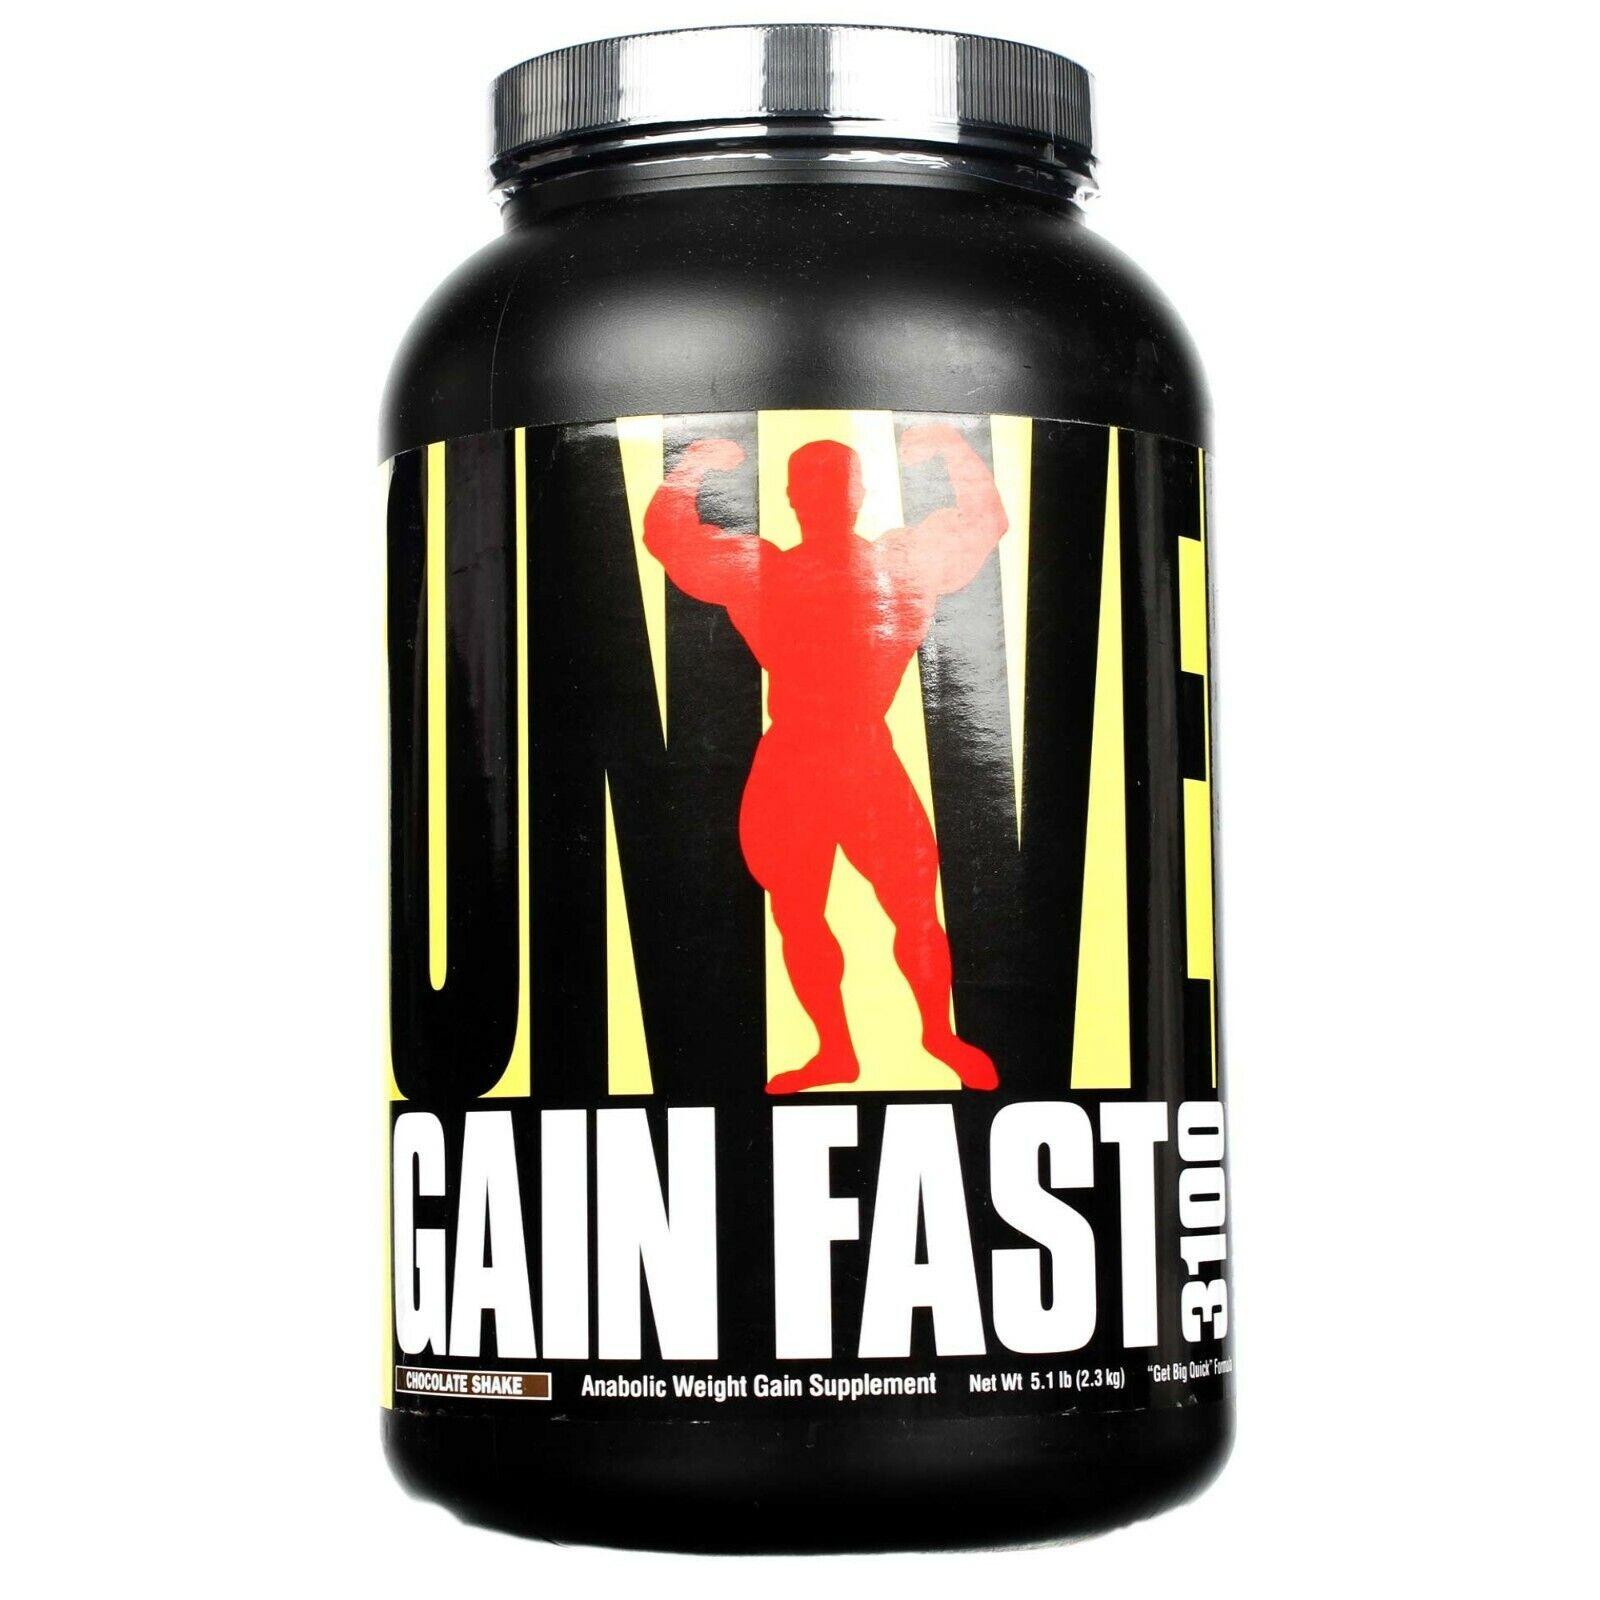 Universal Nutrition GAIN FAST 3100 Protein Mass Weight Gaine